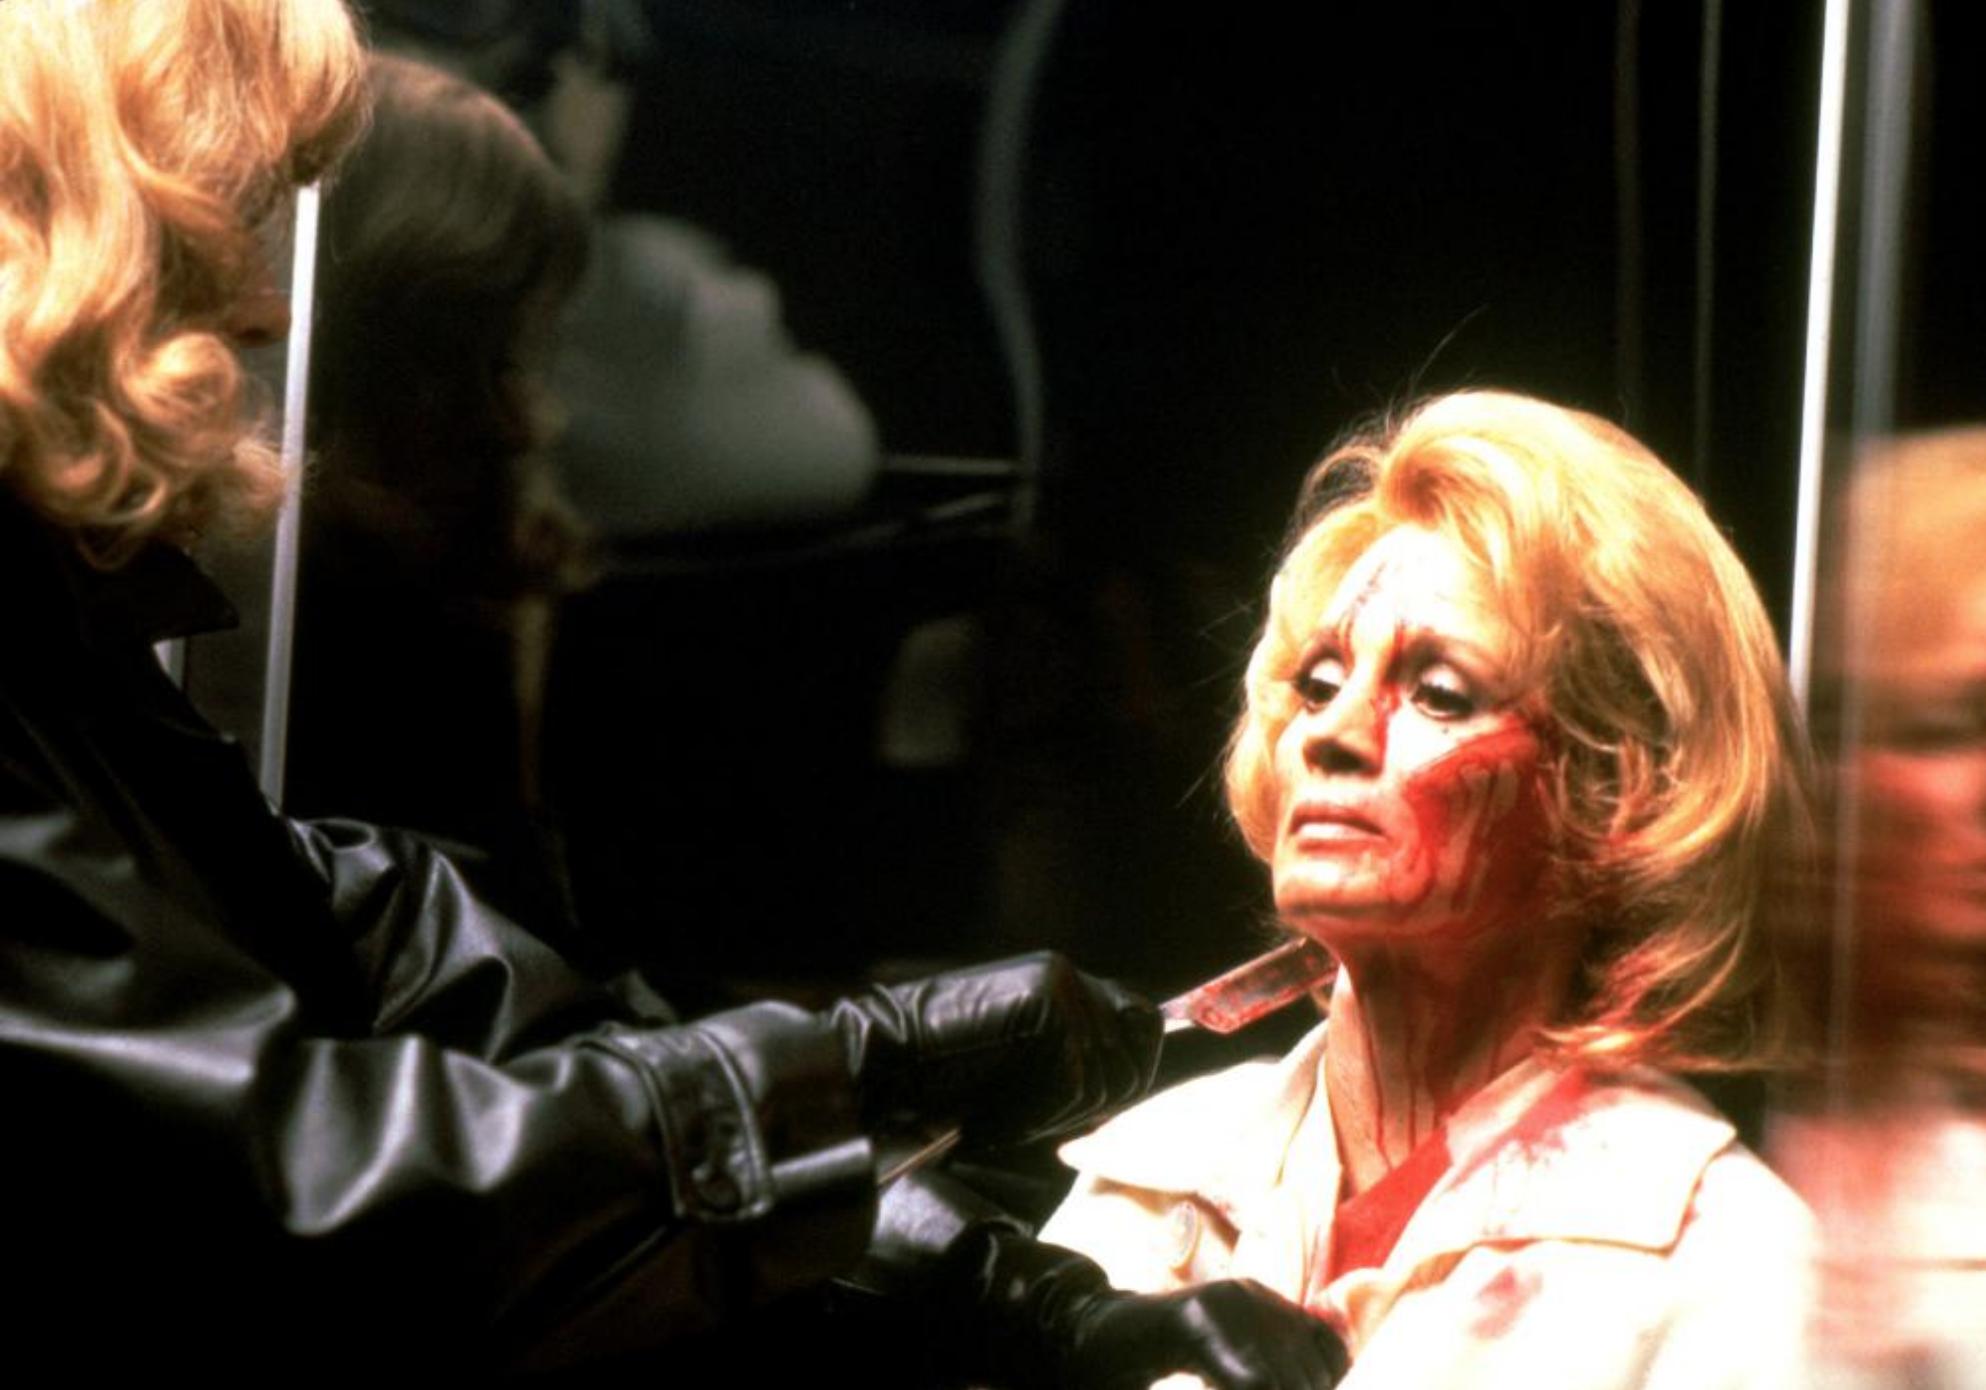 38. De Palma, Brian, Director.  Dressed to Kill.  1980.